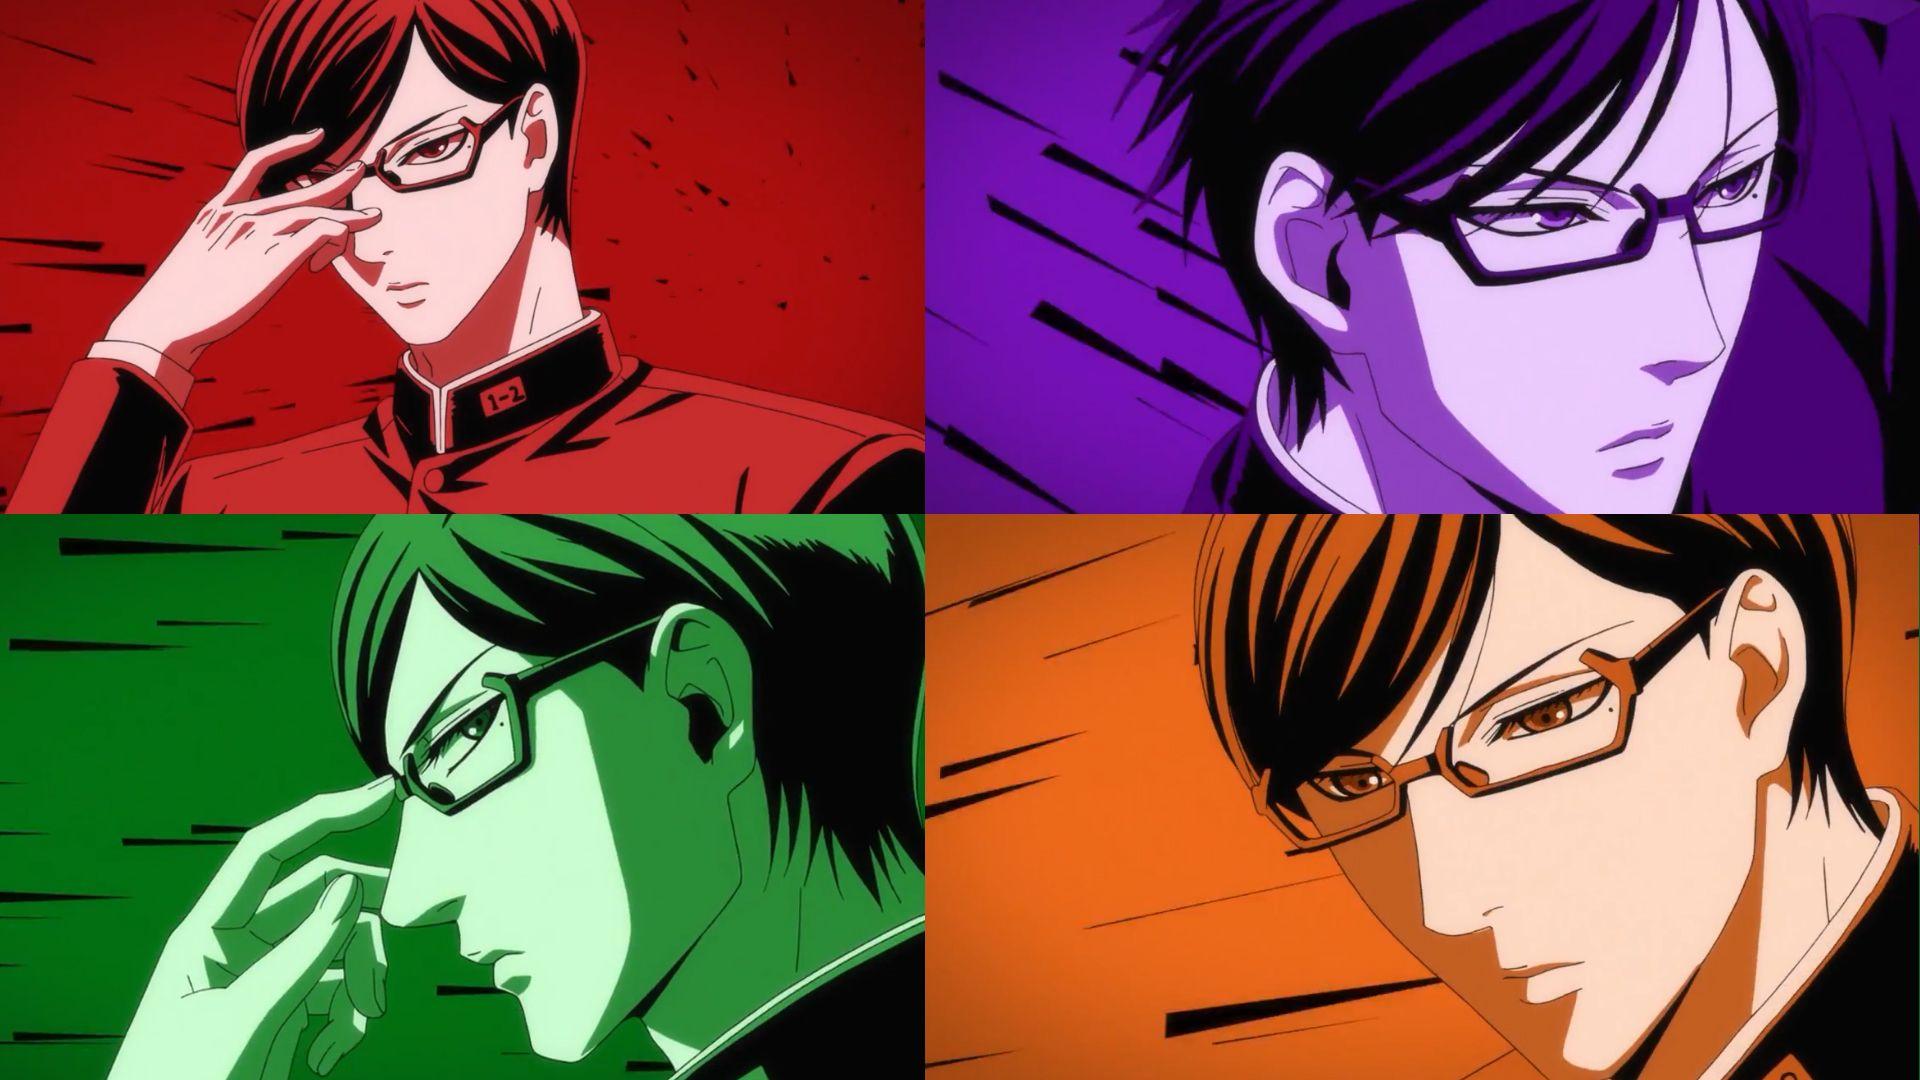 Anime Sakamoto Desu Ga Cool Wallpaper Hd 2327